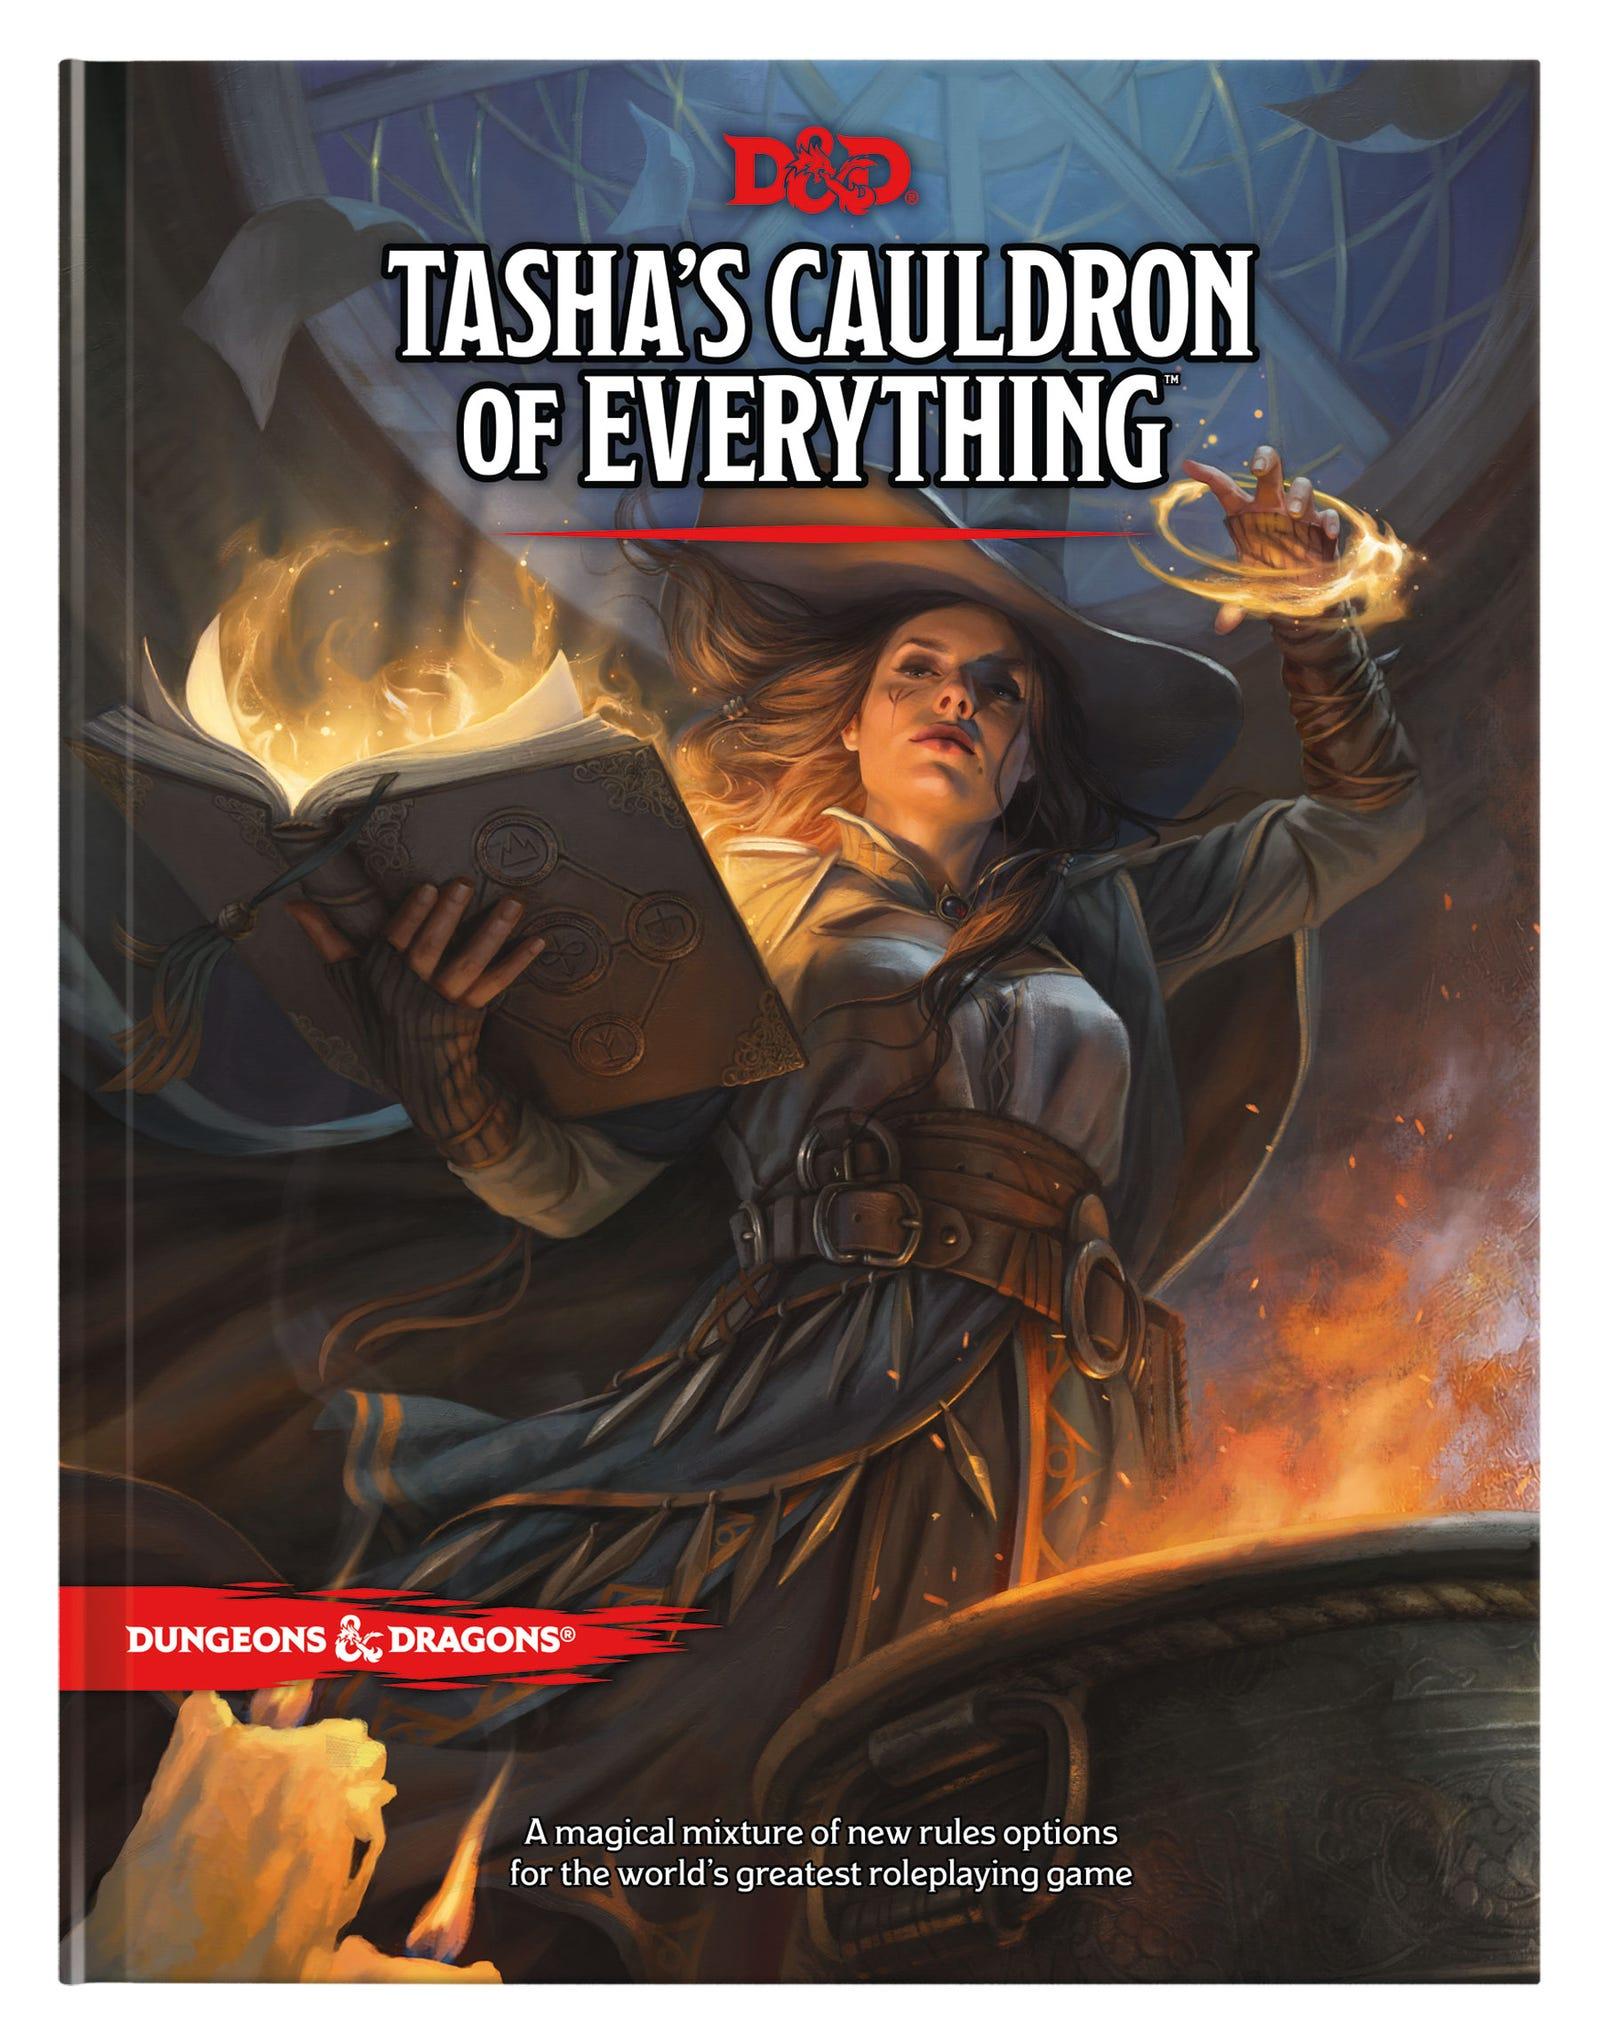 Magali Villeneuve's cover work for Tasha's Cauldron of Everything...